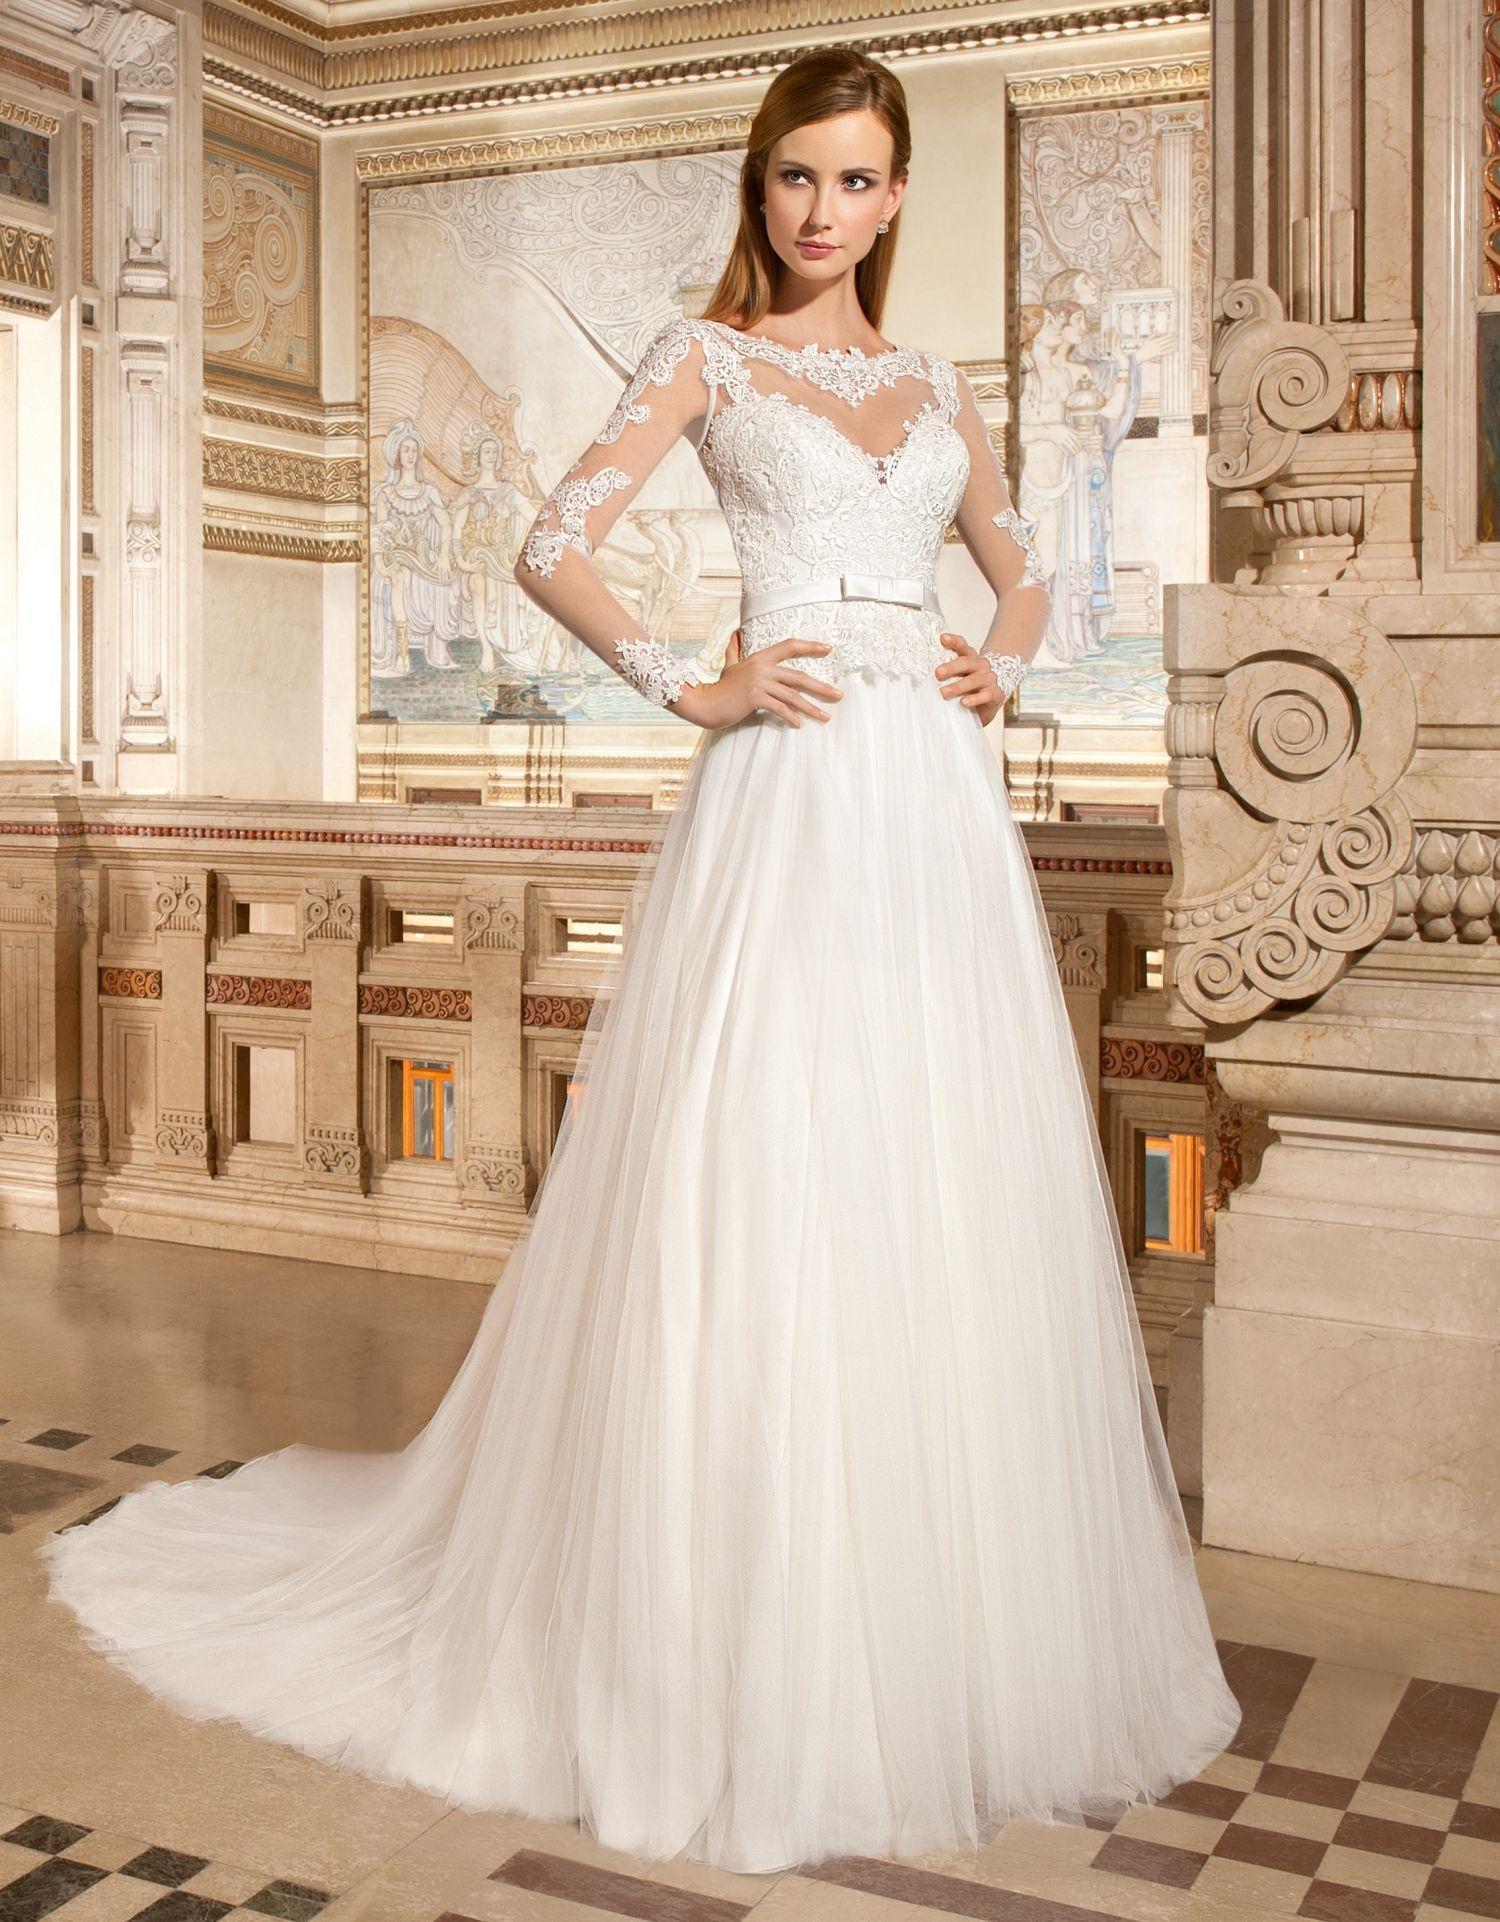 Demetrios gr wedding dresses pinterest wedding dress